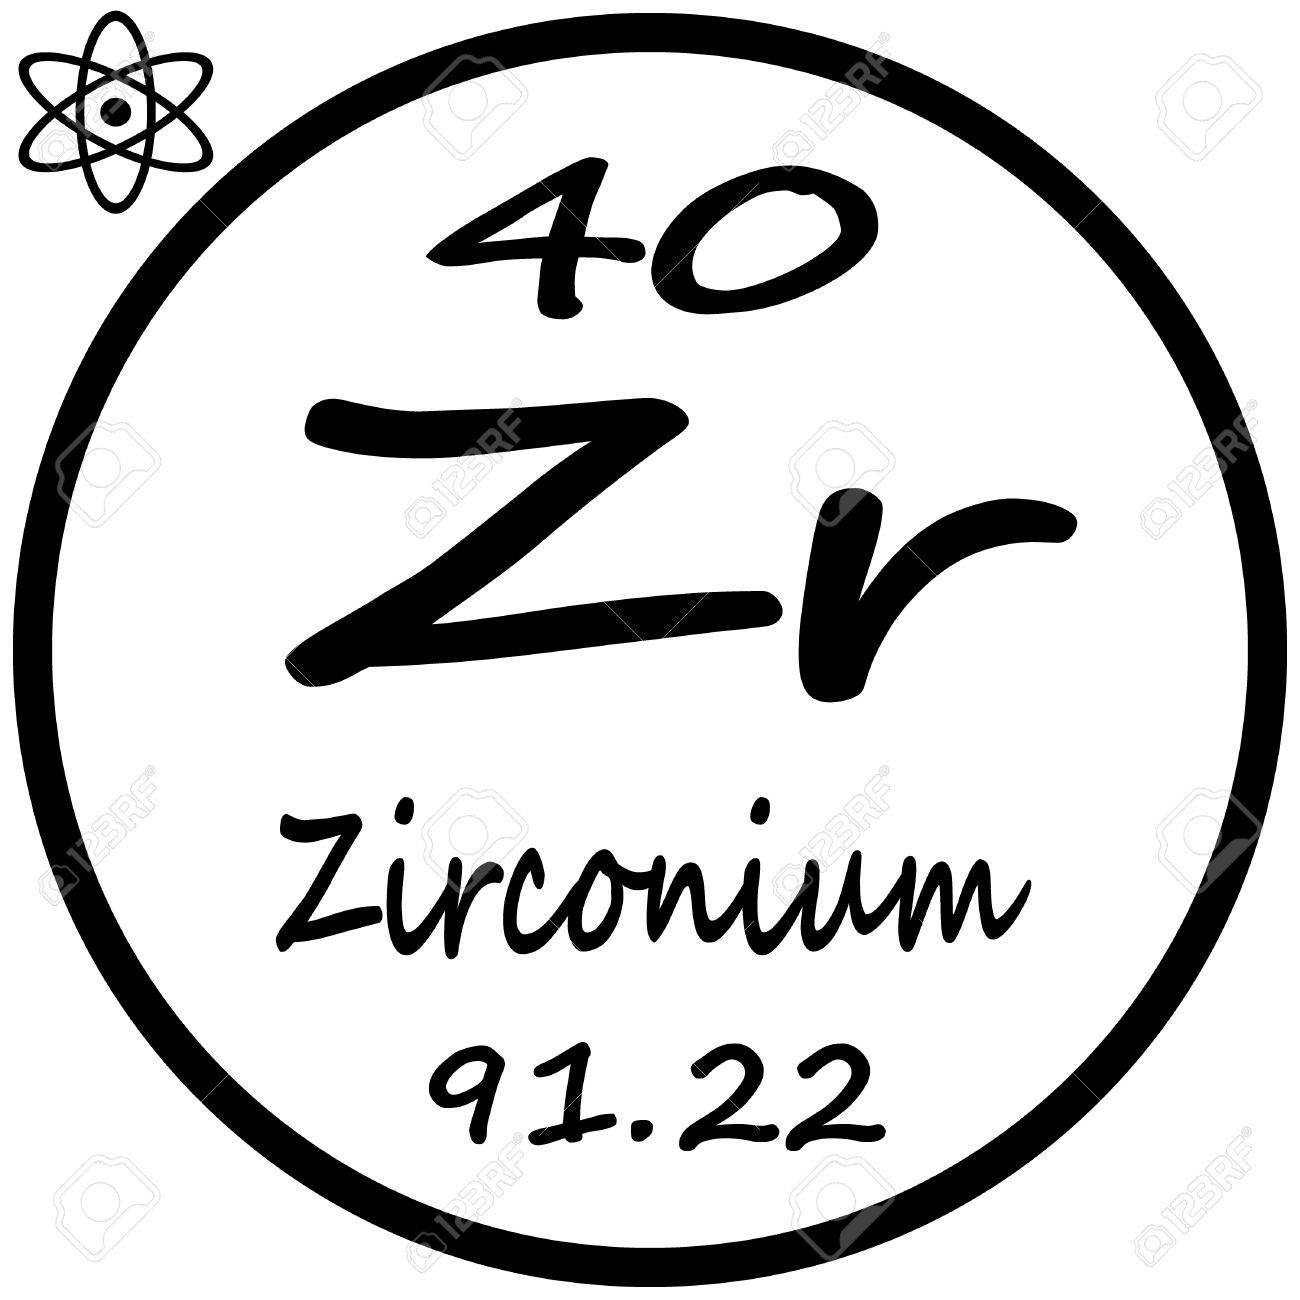 Periodic table zirconium gallery periodic table images zirconium symbol periodic table gallery periodic table images periodic table of elements zirconium royalty free cliparts gamestrikefo Images